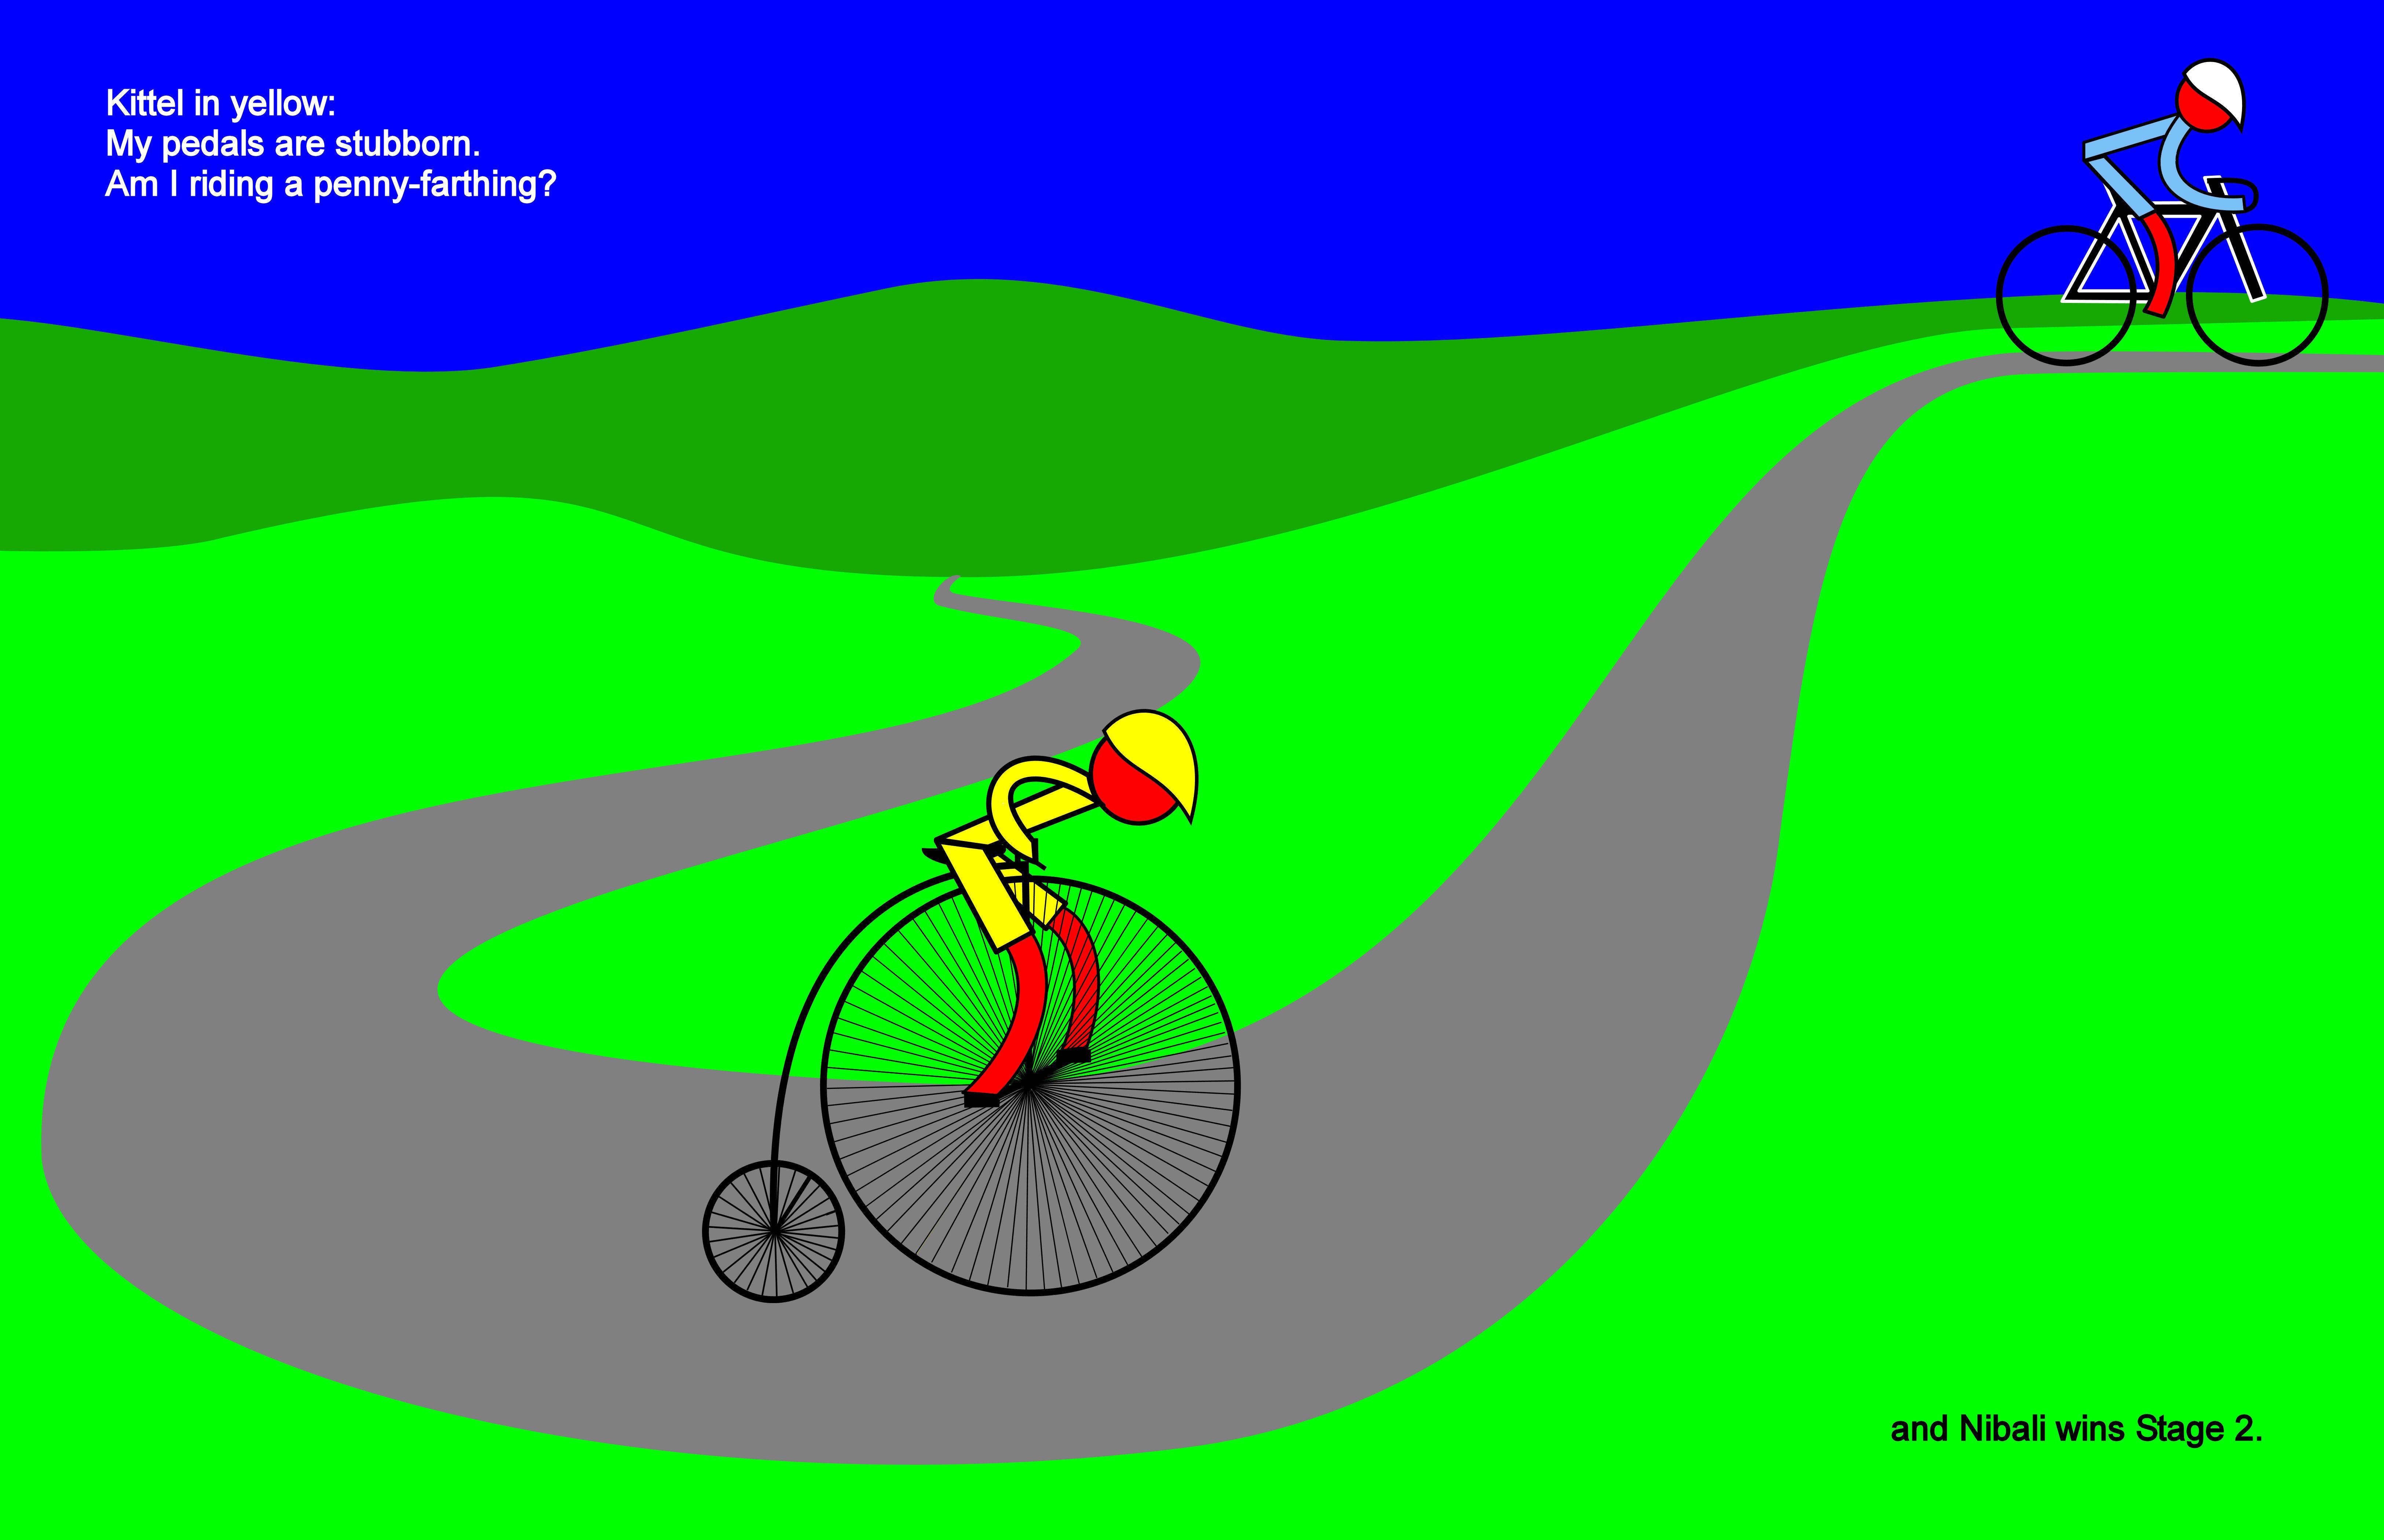 York,                                                         Sheffield,                                                         Kittel,                                                         penny-farthing,                                                         Nibali, Stage 2,                                                         July 6th, Tour                                                         de France 2014,                                                         Tour de France,                                                         York, Sheffield,                                                         Kittel, sou-sou,                                                         Nibali, étape 2,                                                         le 6 Juillet,                                                         Tour de France                                                         2014, Tour de                                                         France